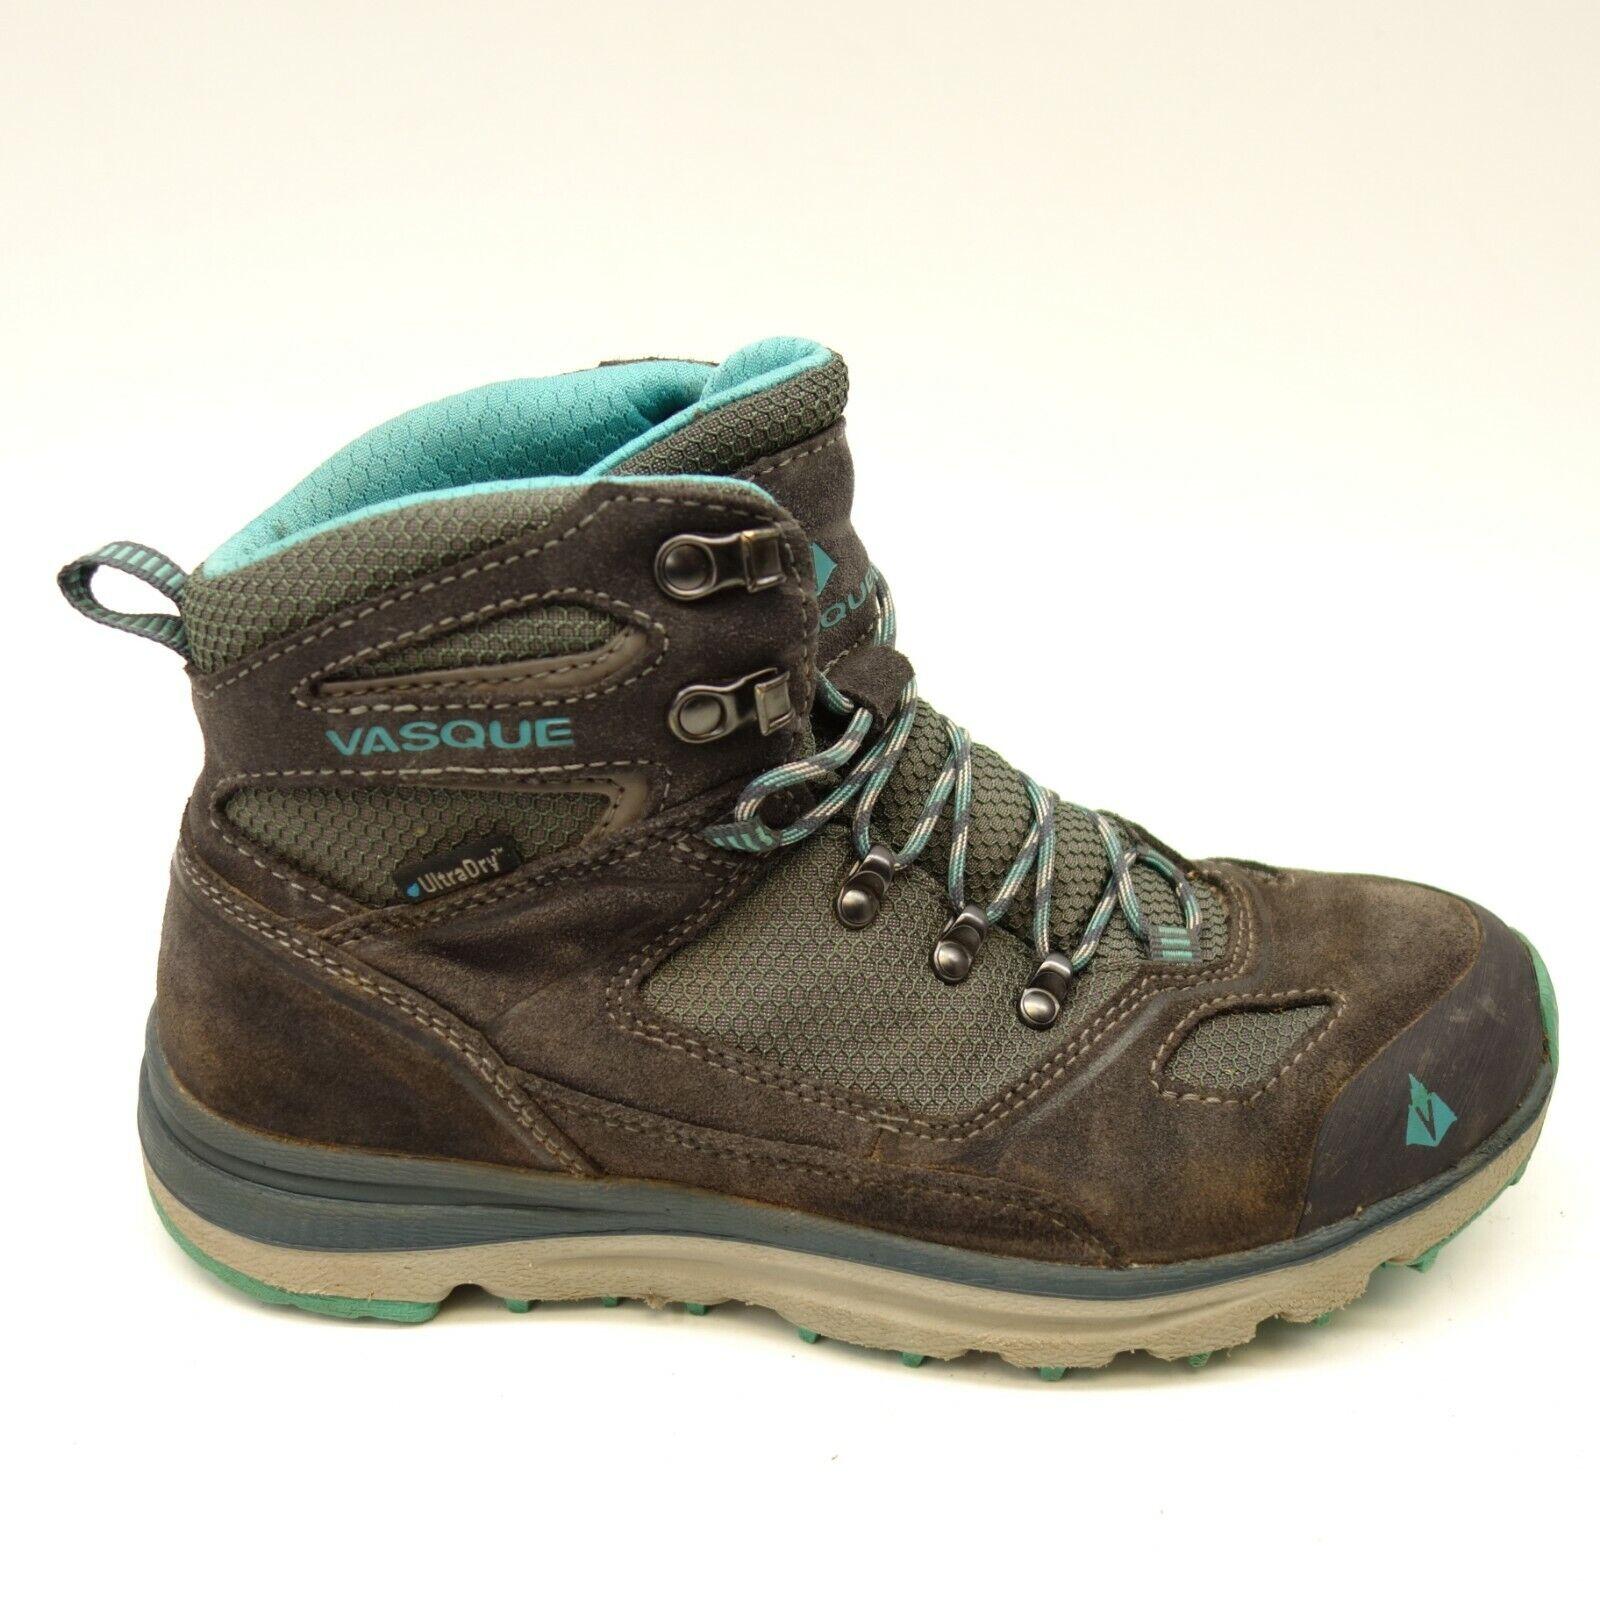 Vasque Womens Mesa Trek Ultradry Athletic Hiking Trail Outdoor Mid Boots Sz 7M